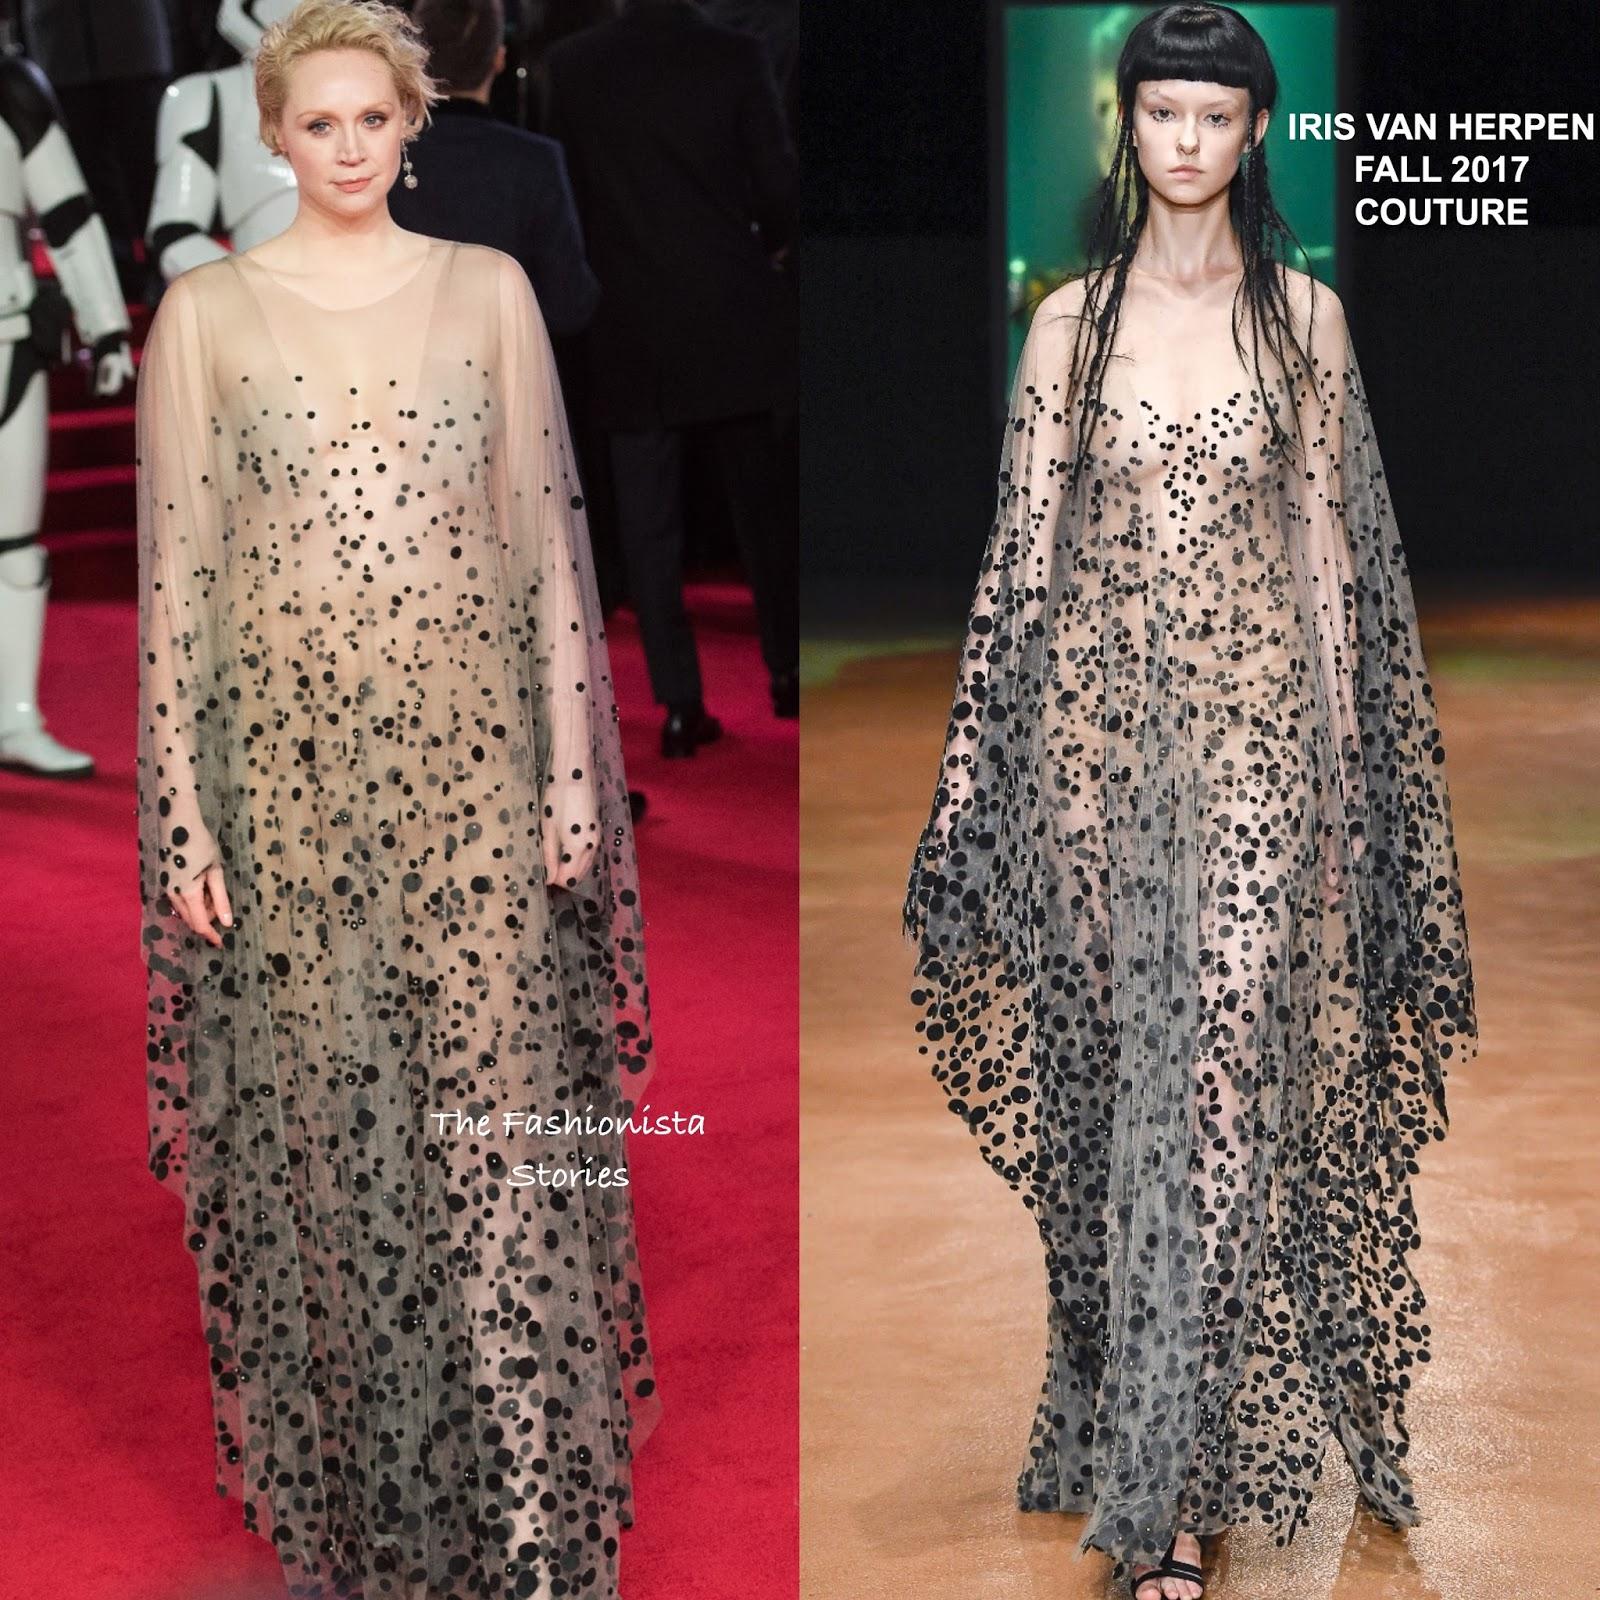 Gwendoline Christie Nude Pictures with gwendoline christie in iris van herpen couture at the 'star wars